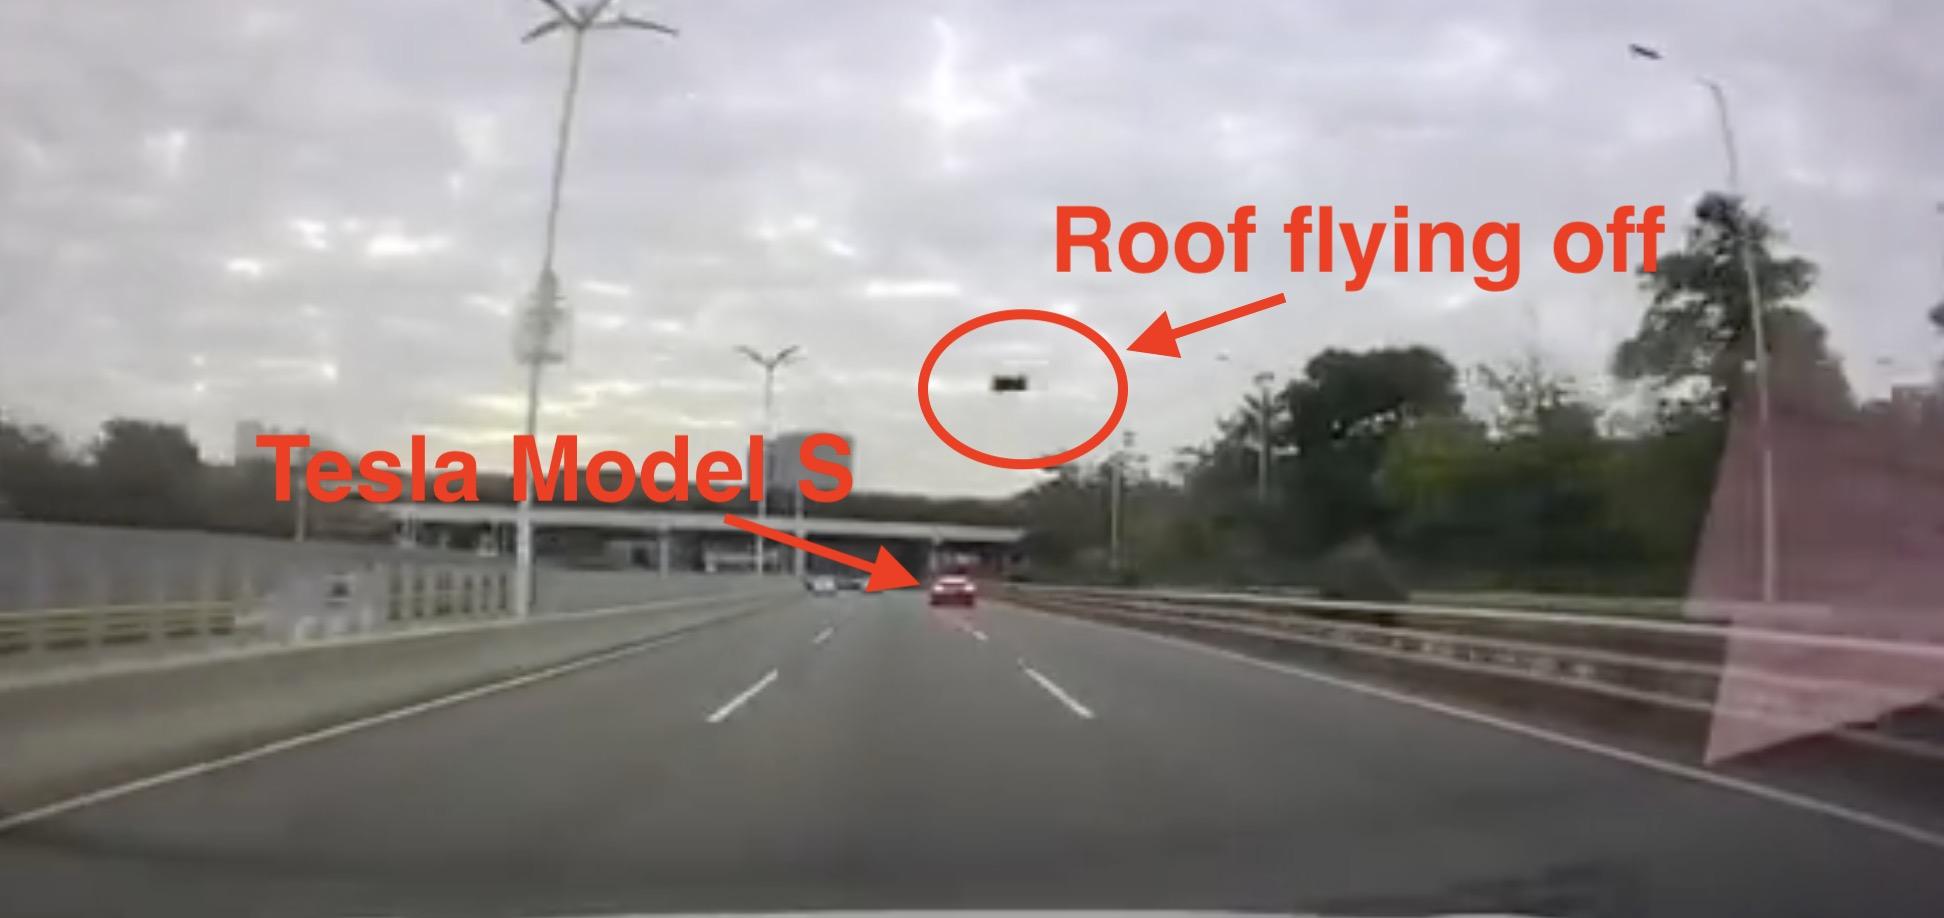 Tesla Model S roof flying off jpg?quality=82&strip=all